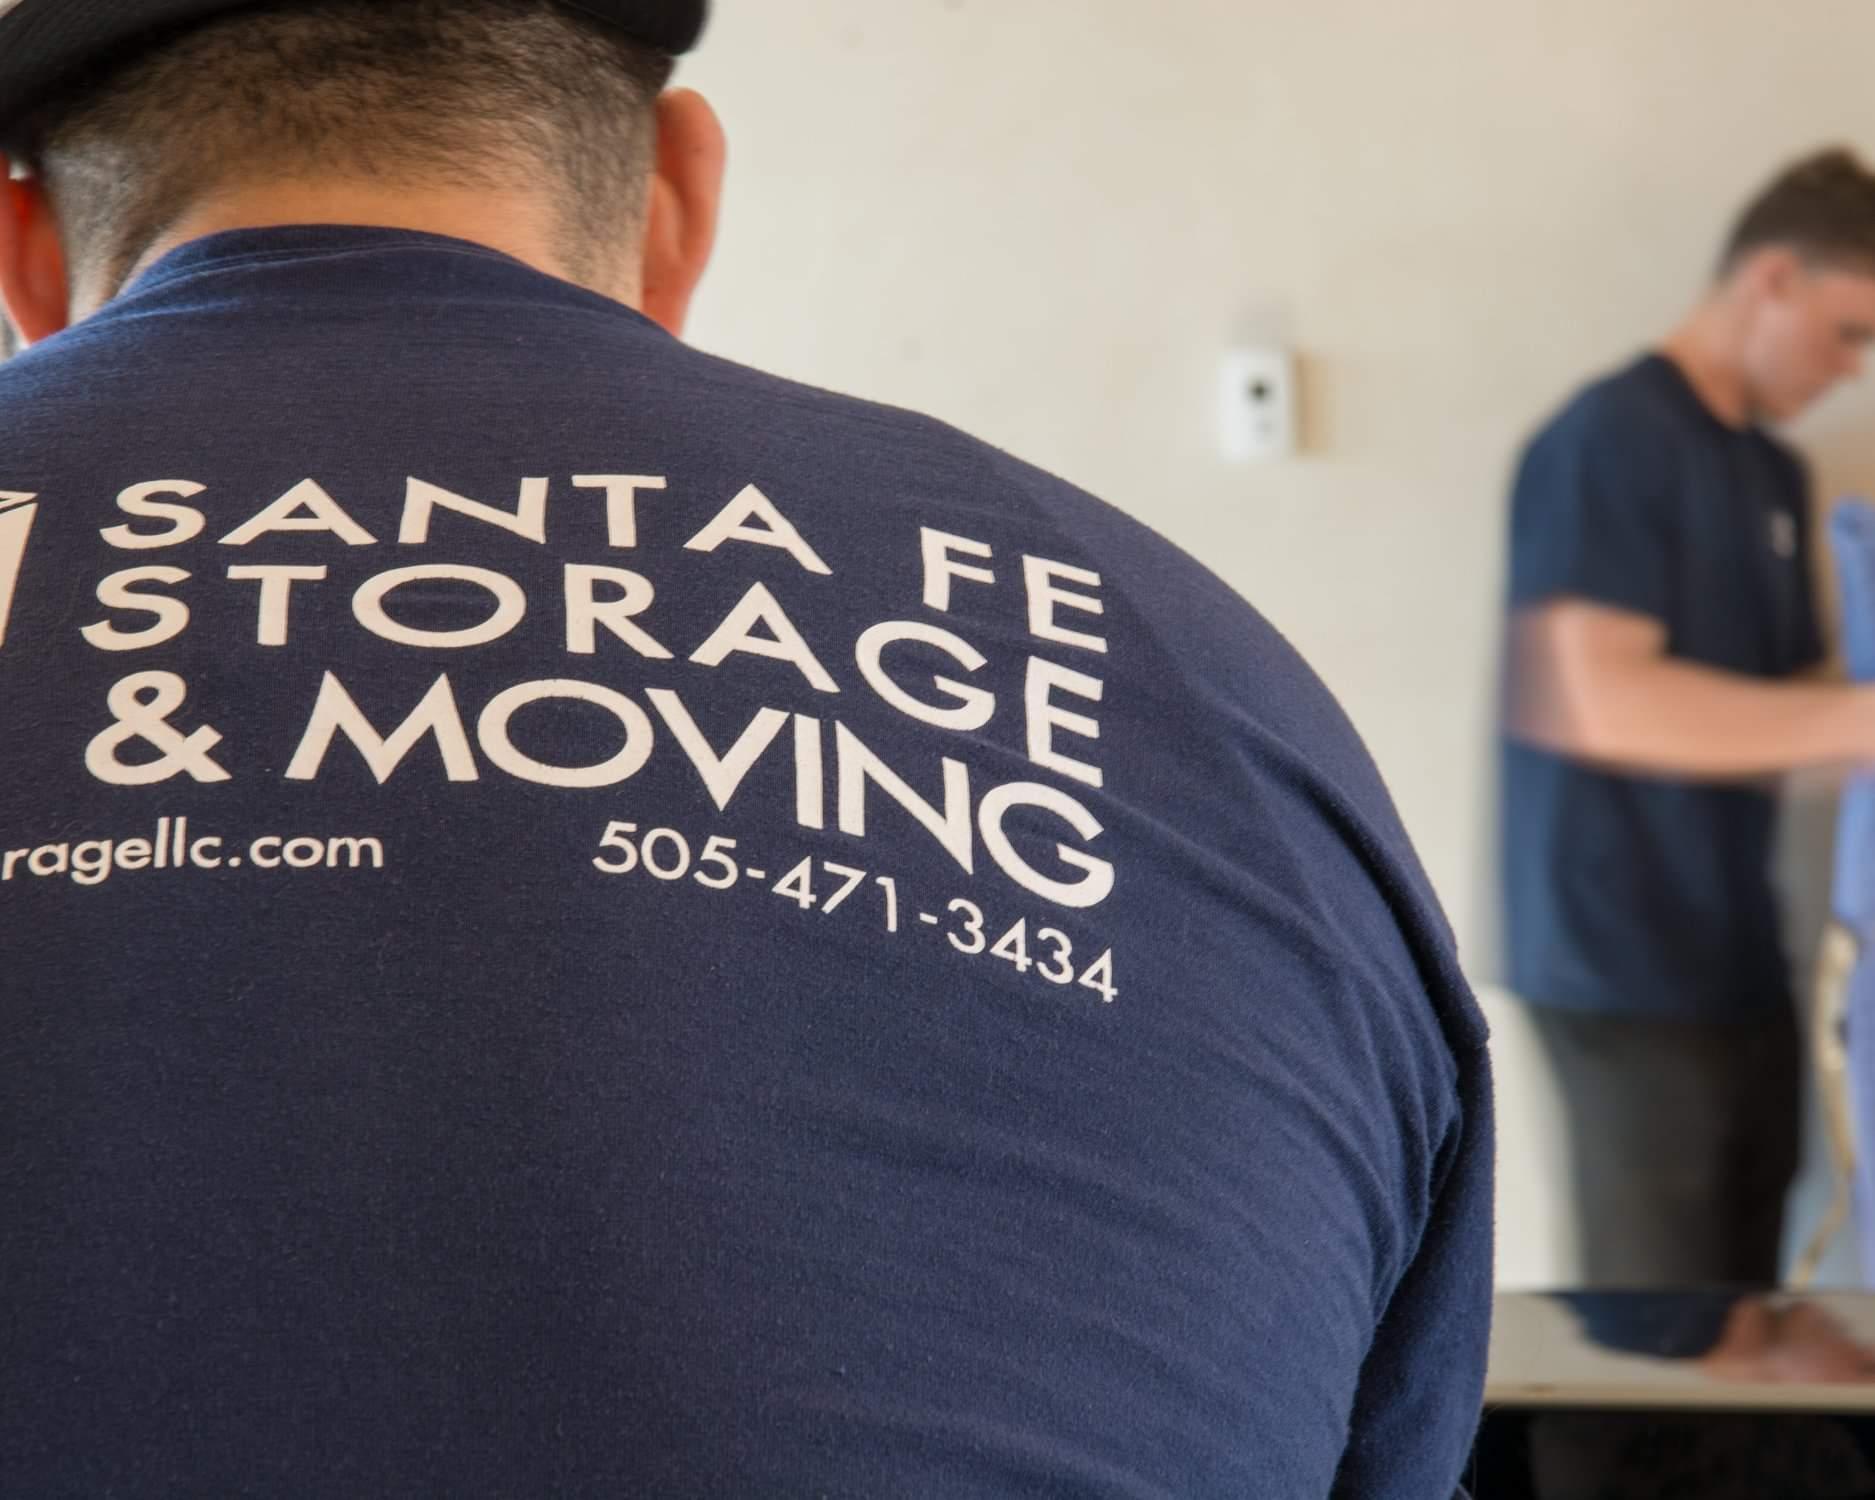 new mexico long distance movers_santafestoragellc.jpg